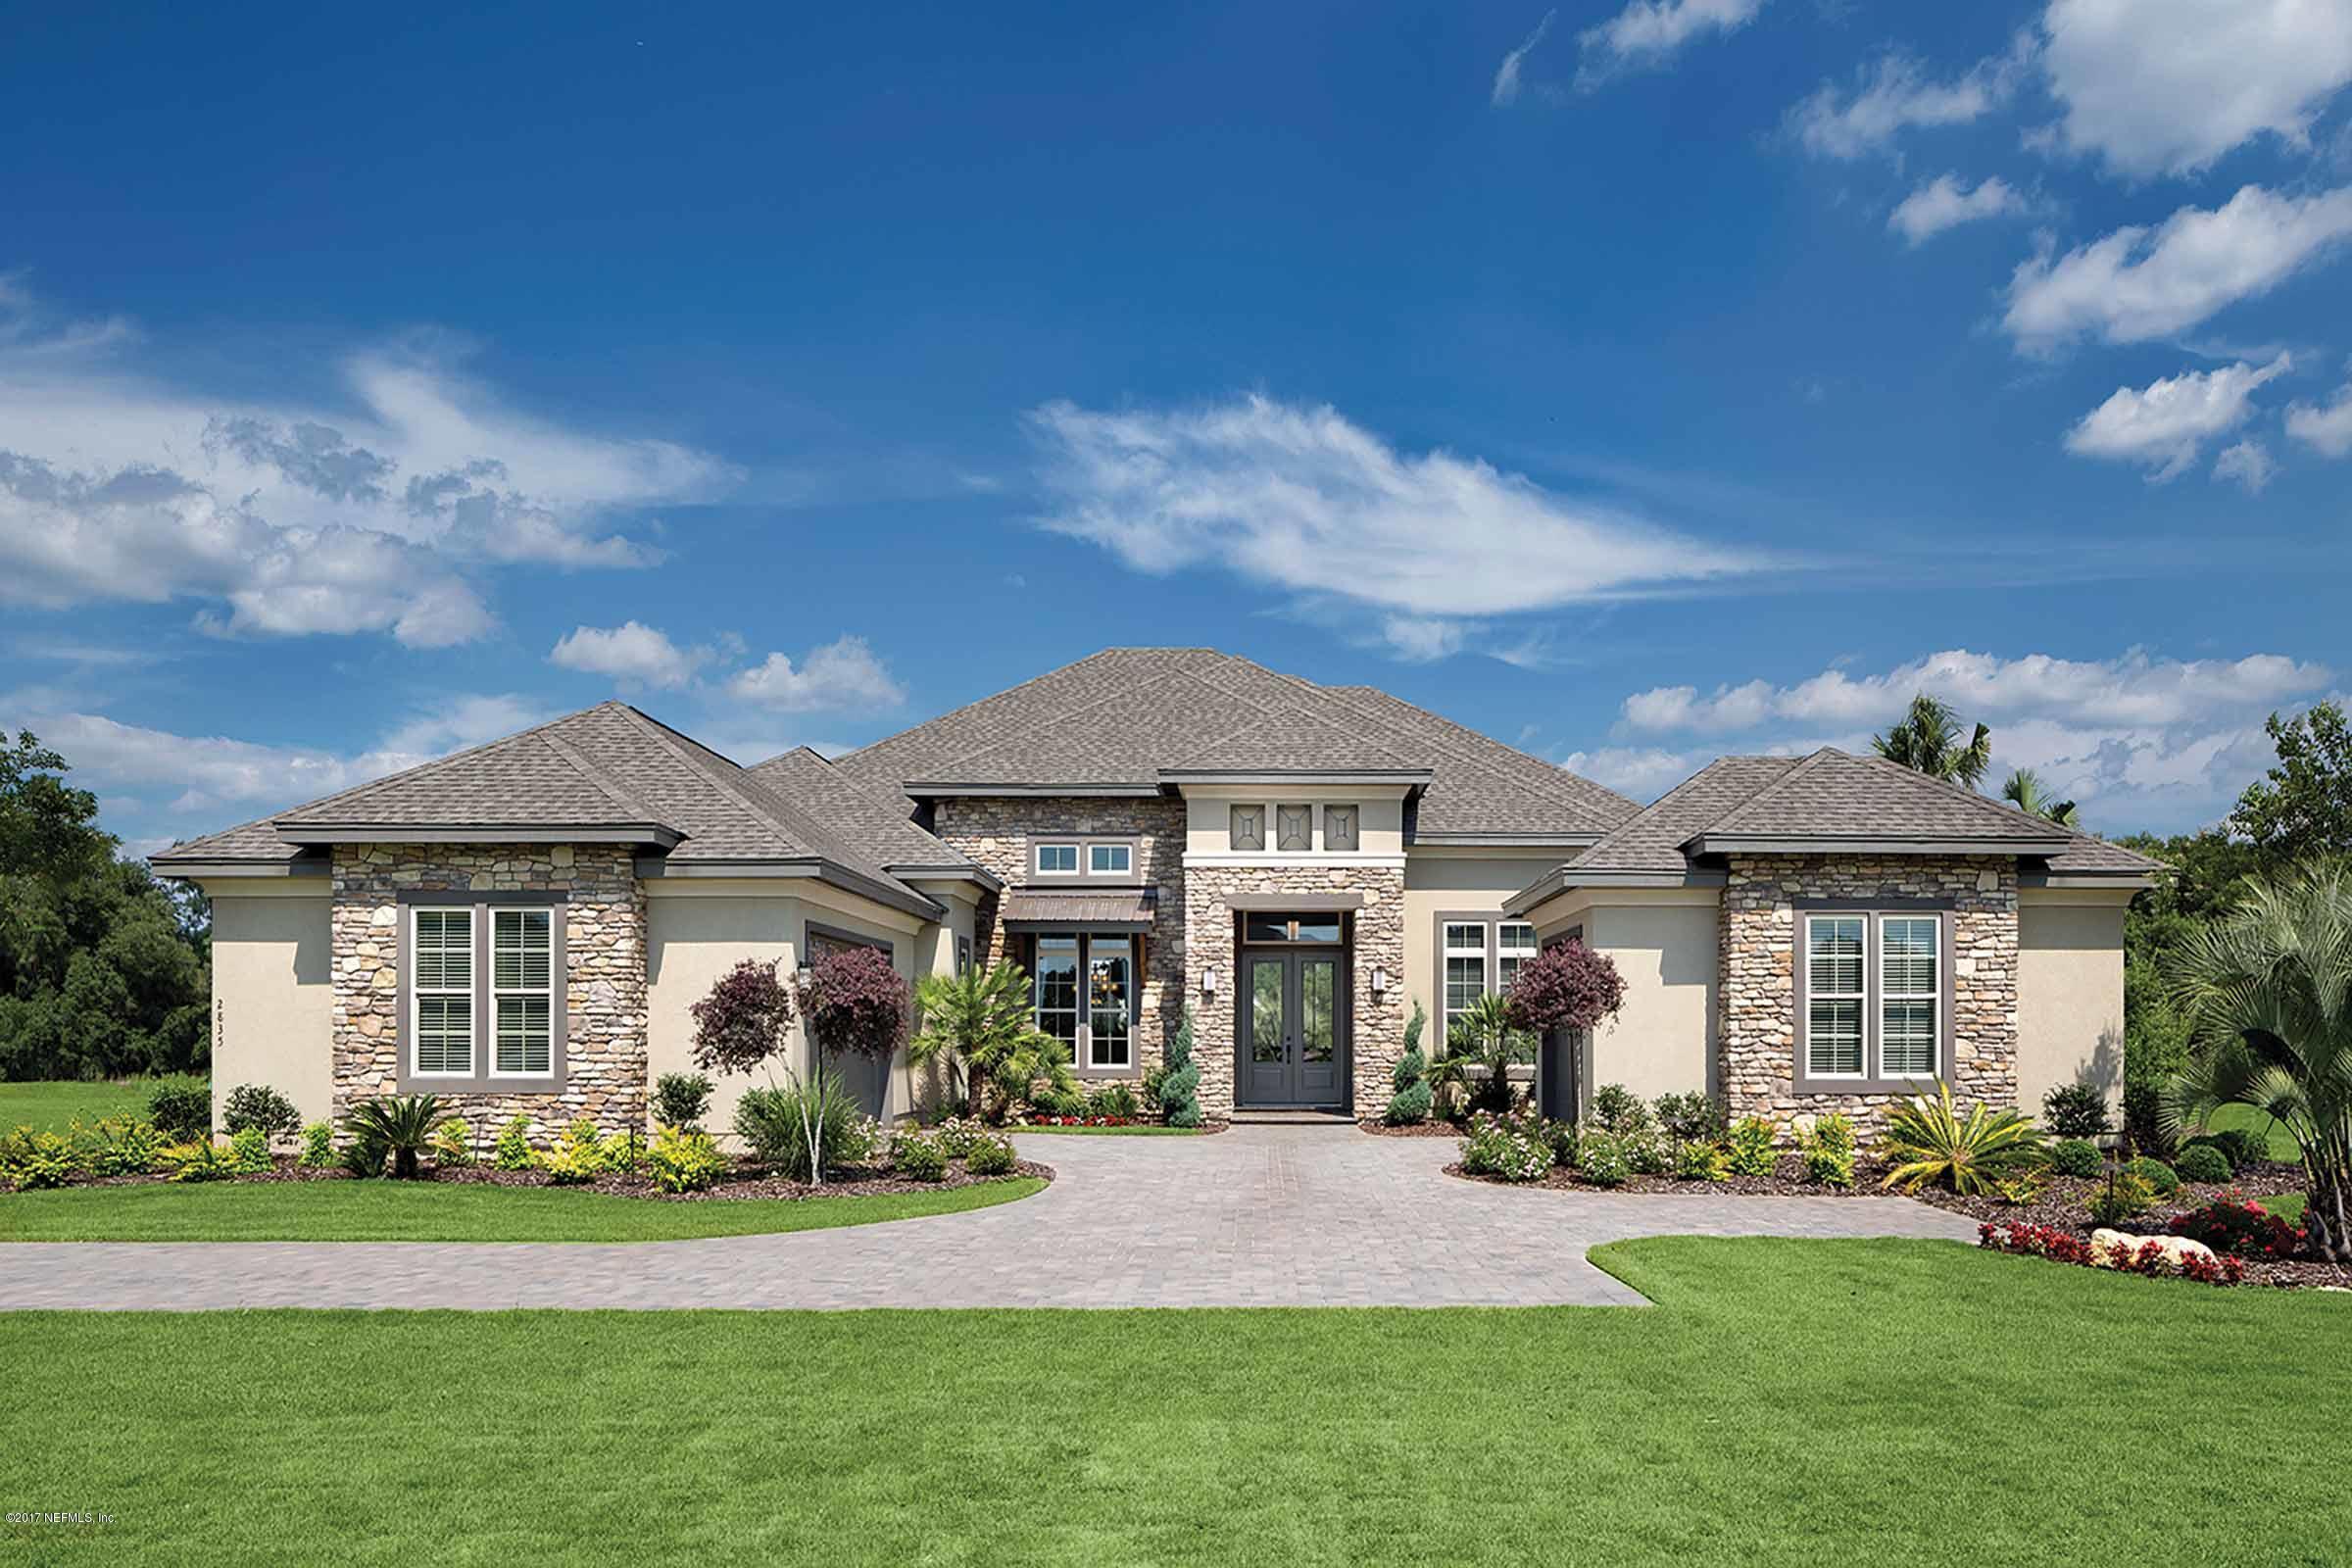 79A SAN CRISTOBAL, ST AUGUSTINE, FLORIDA 32095, 4 Bedrooms Bedrooms, ,3 BathroomsBathrooms,Residential - single family,For sale,SAN CRISTOBAL,894716